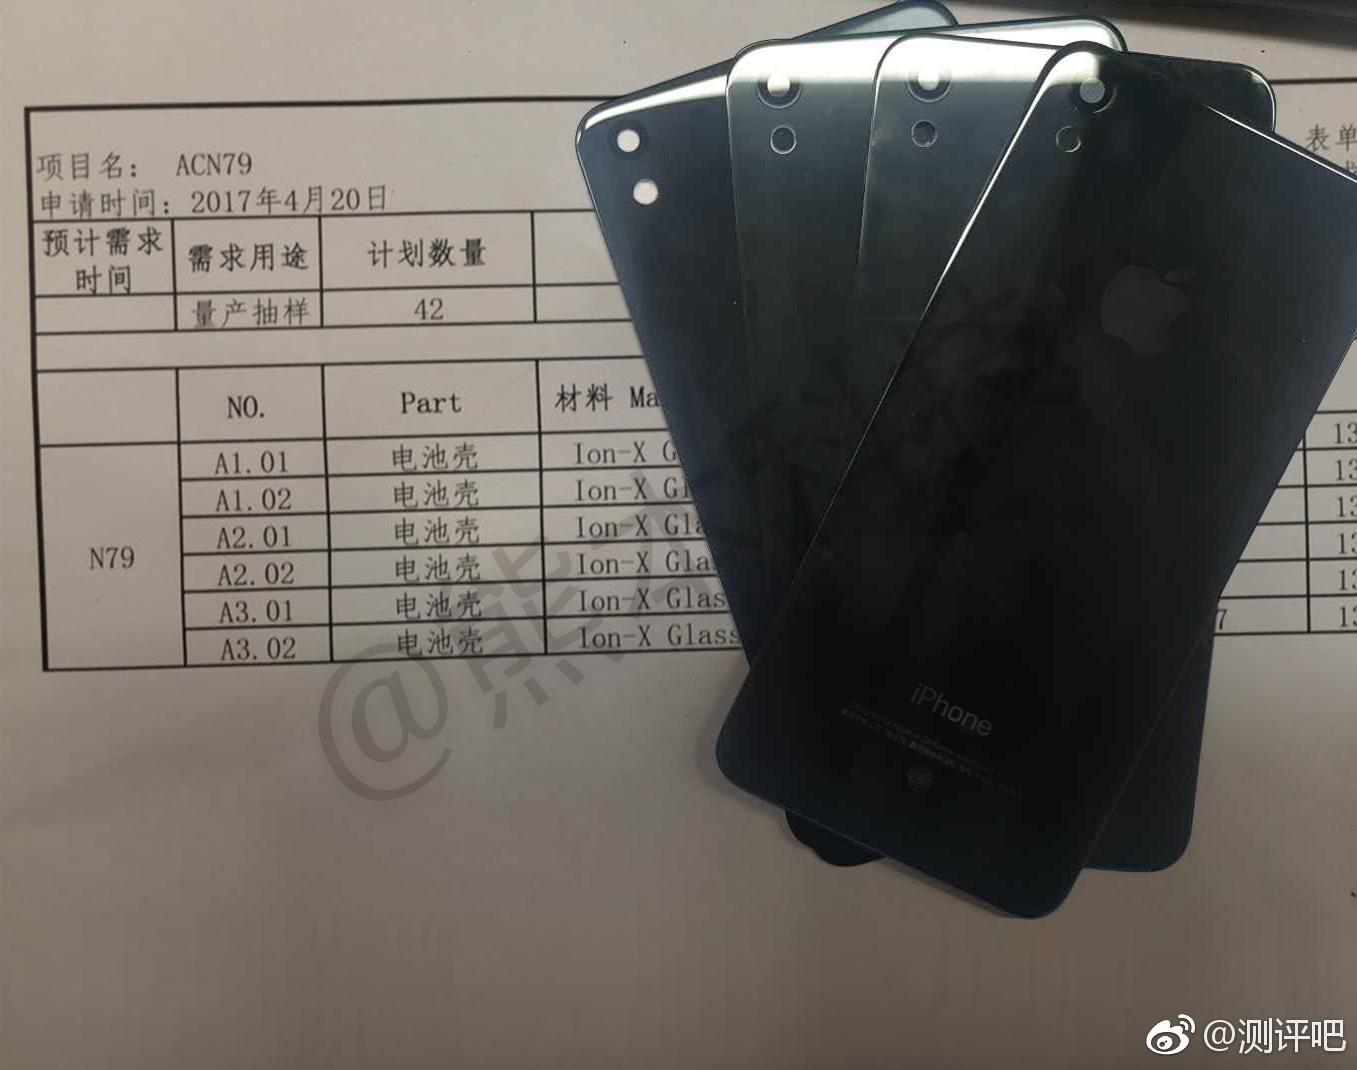 Apple iPhone SE (2017) back leak